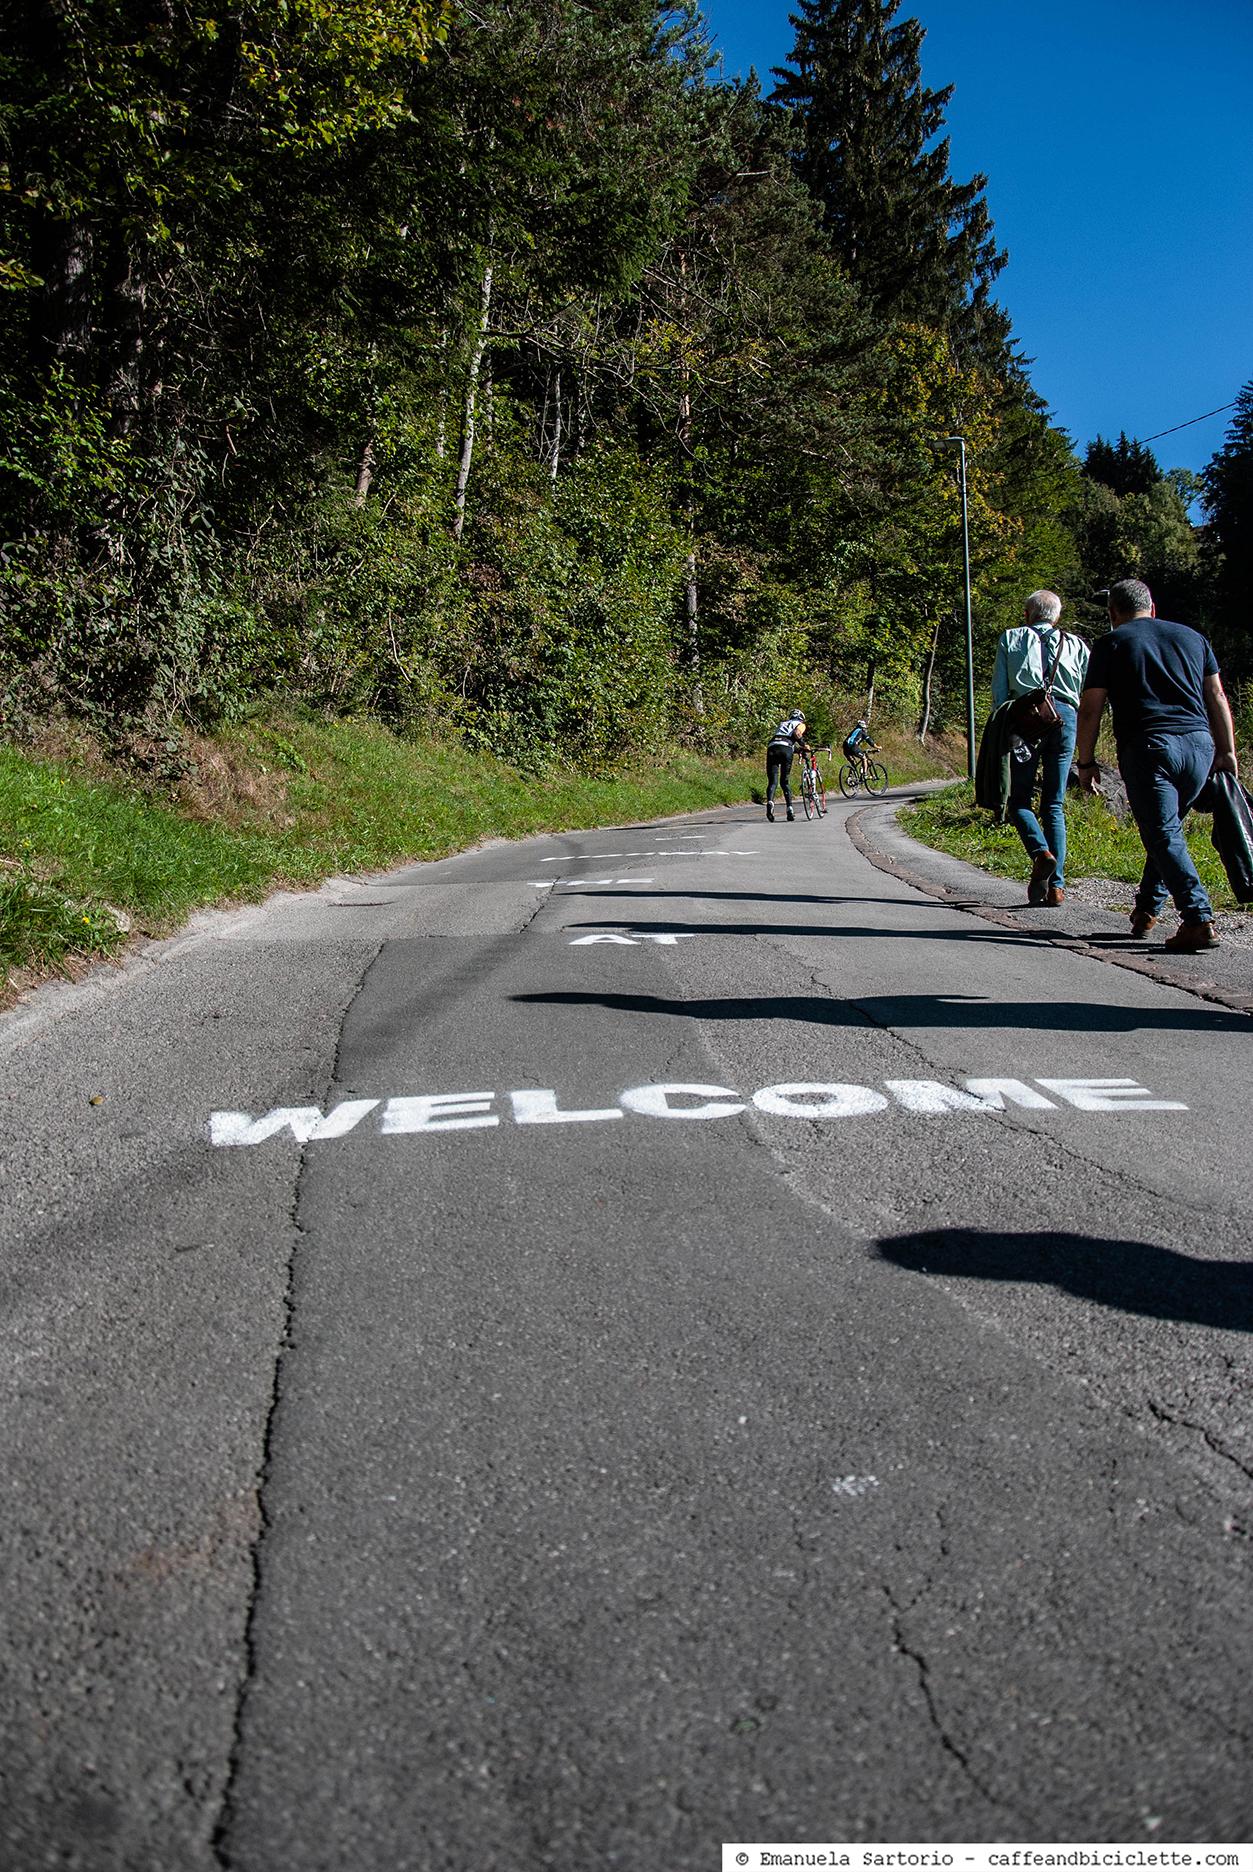 Innsbruck 2018 - UCI Road World Championship